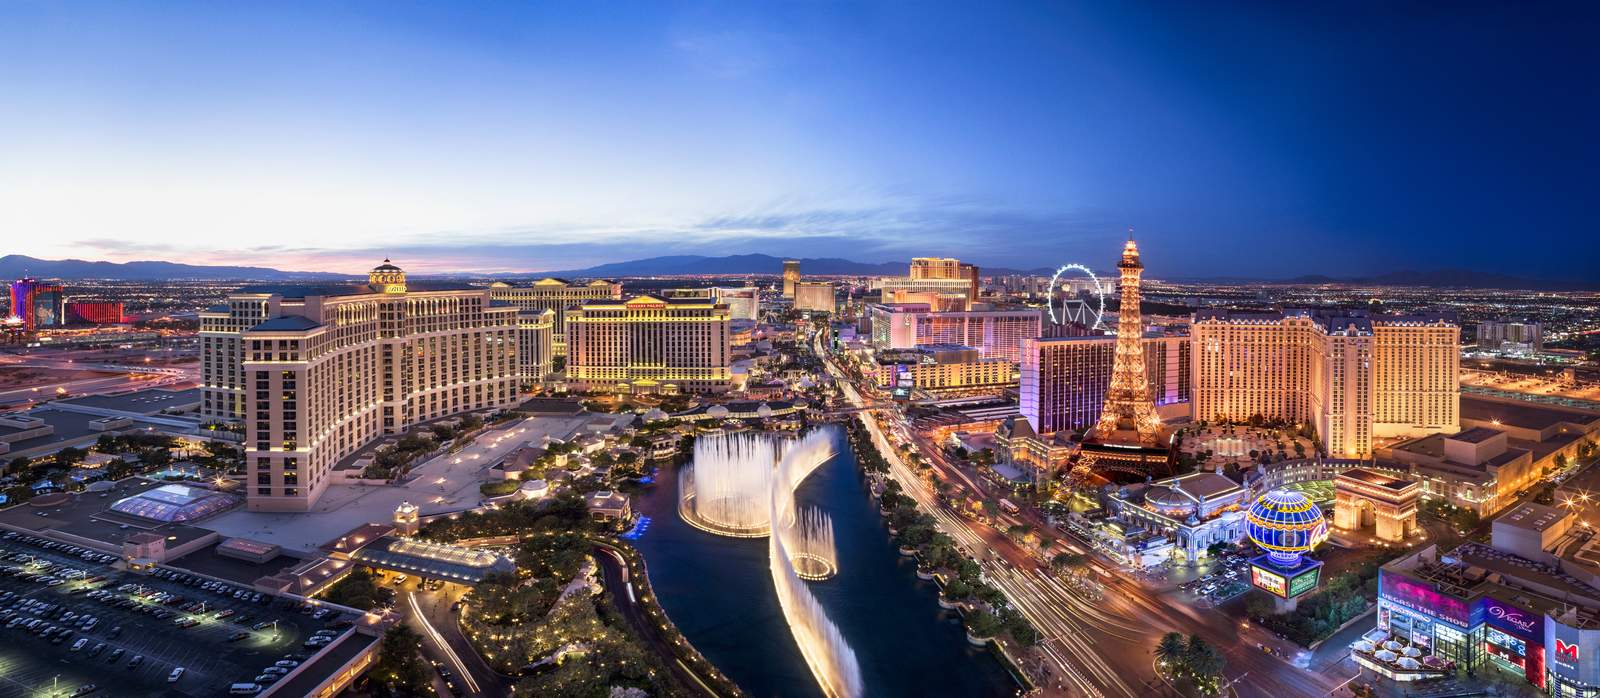 Las Vegas am Abend, Las Vegas, Nevada